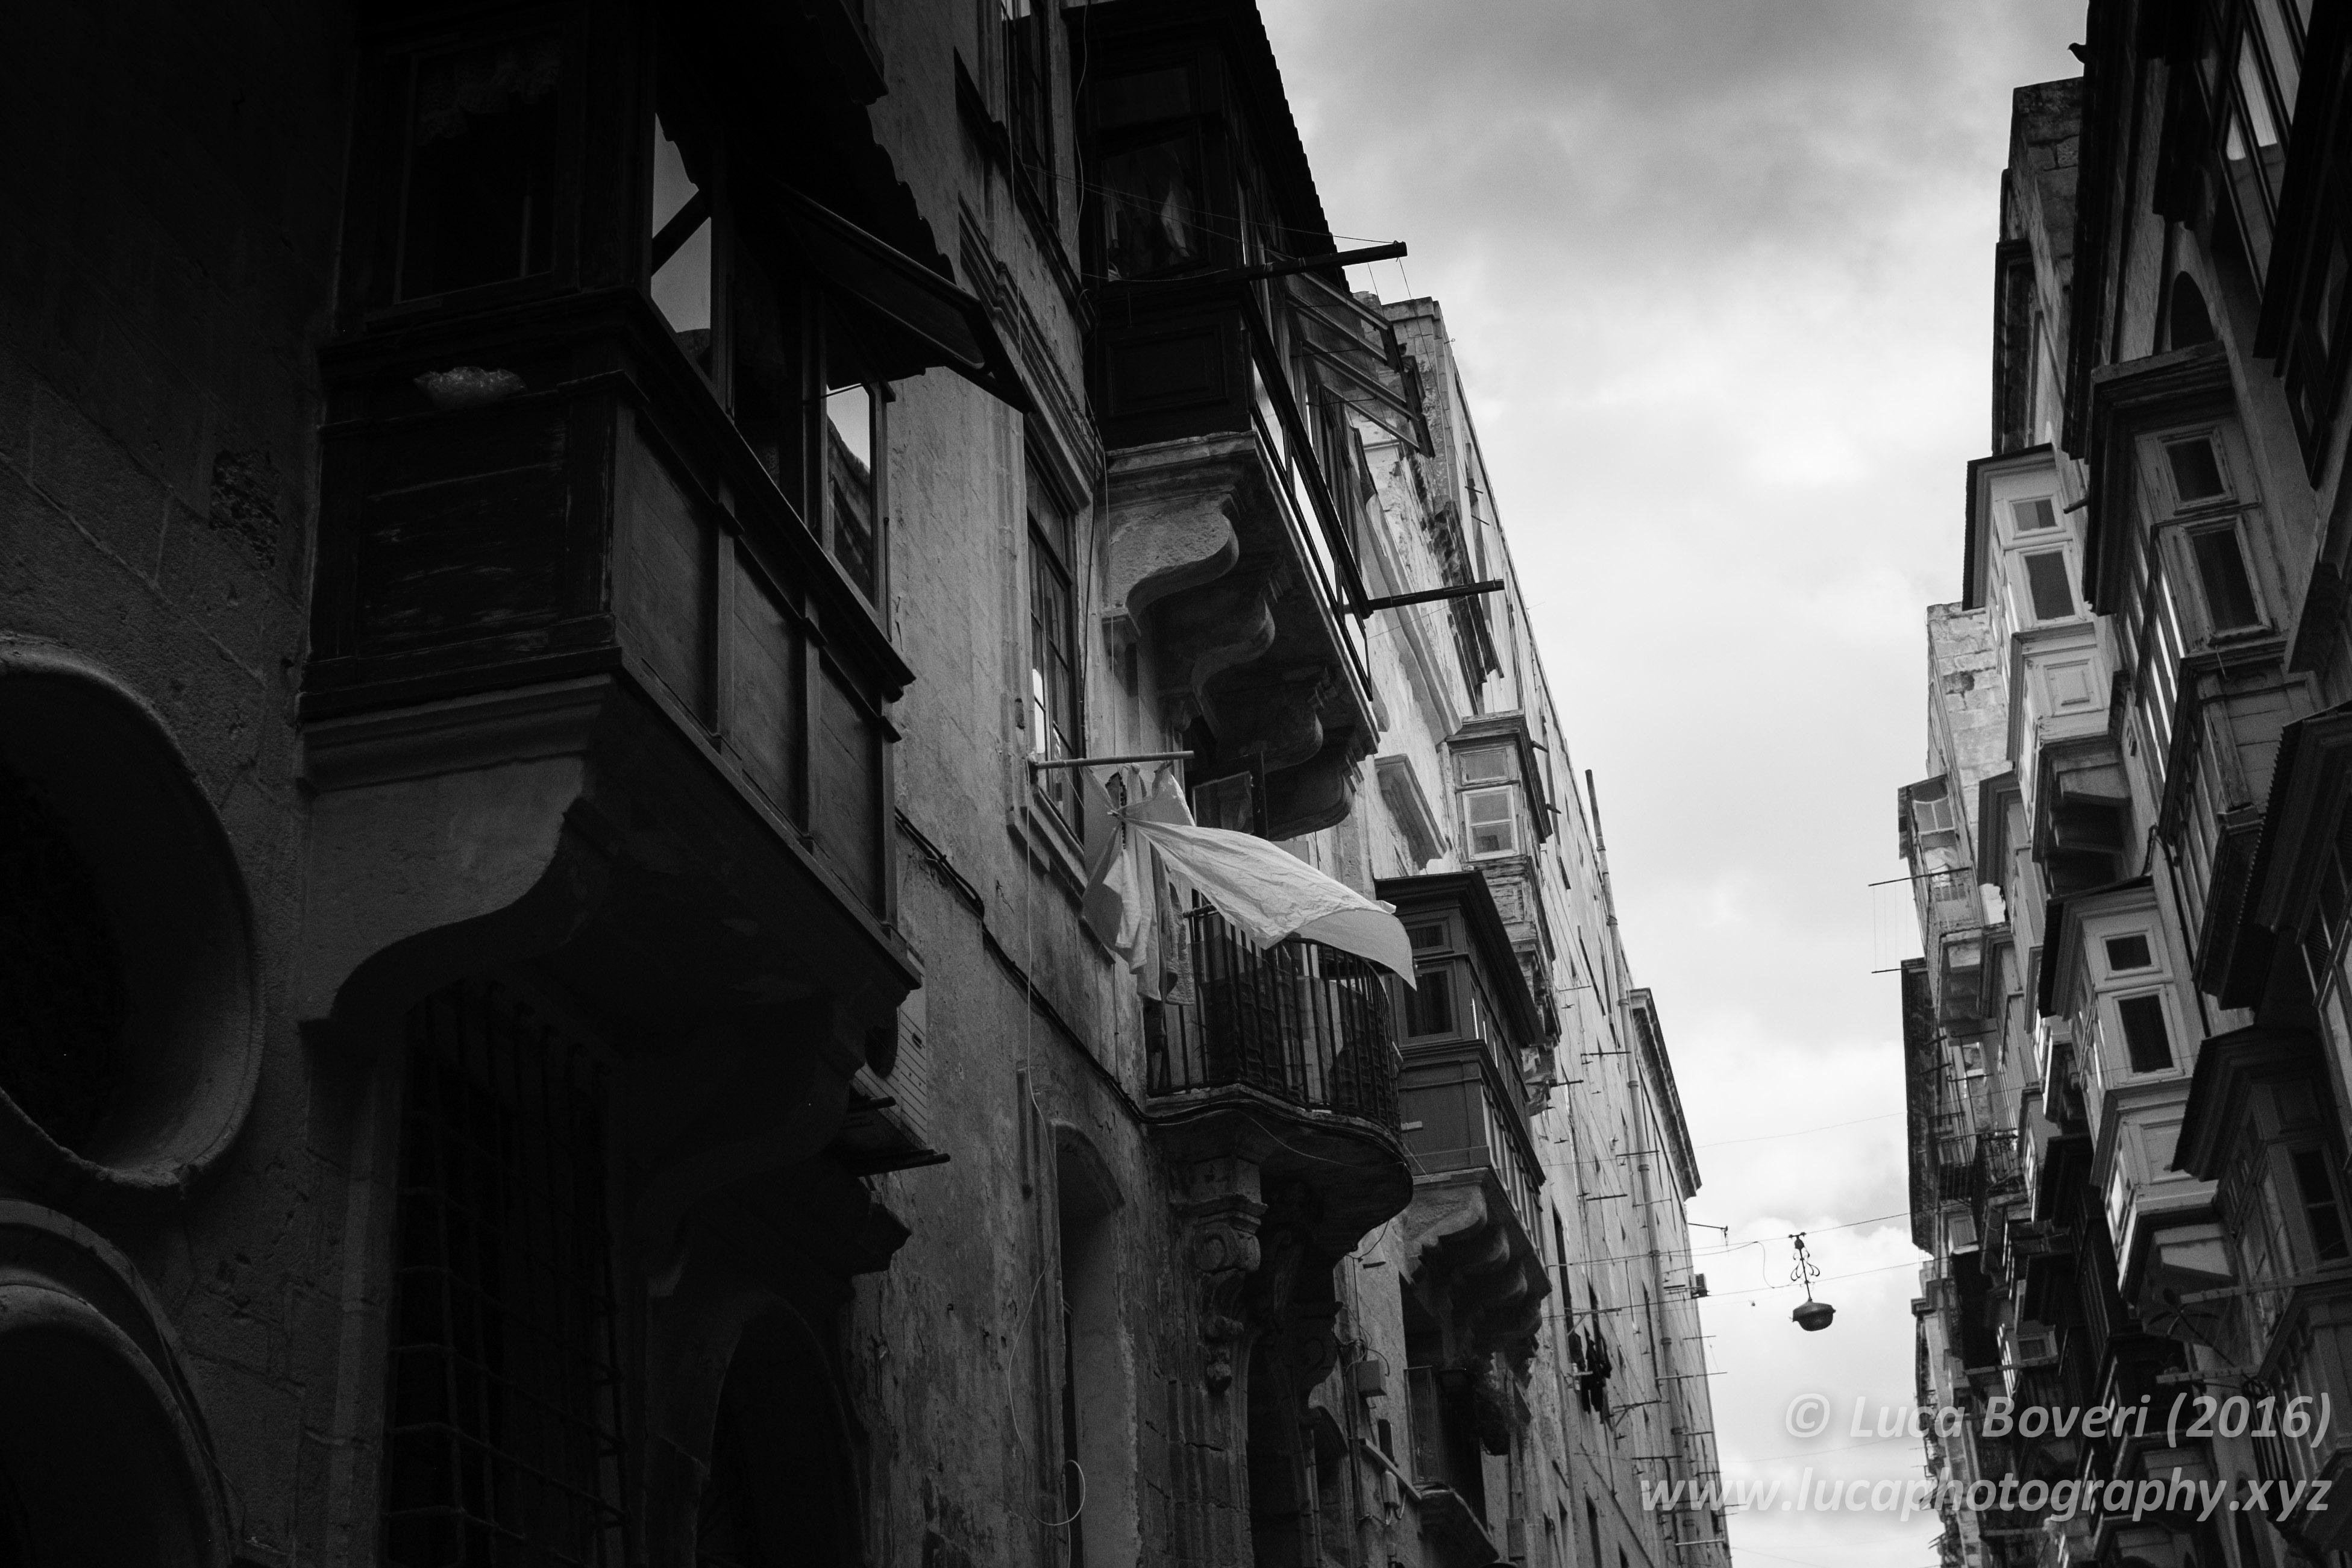 Buildings in Malta. @lucaboveri